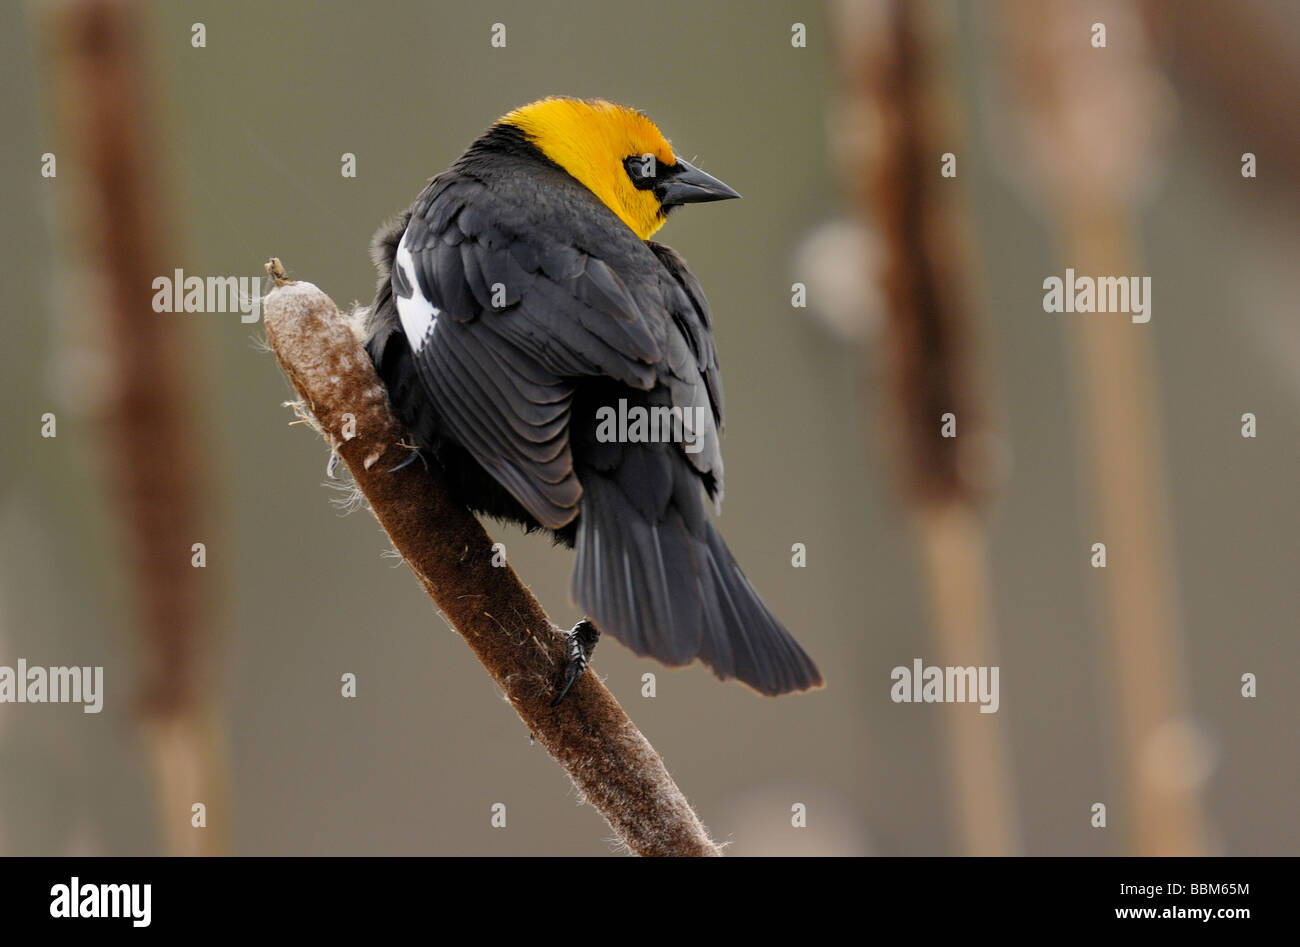 Yellow-headed Blackbird Stock Photo